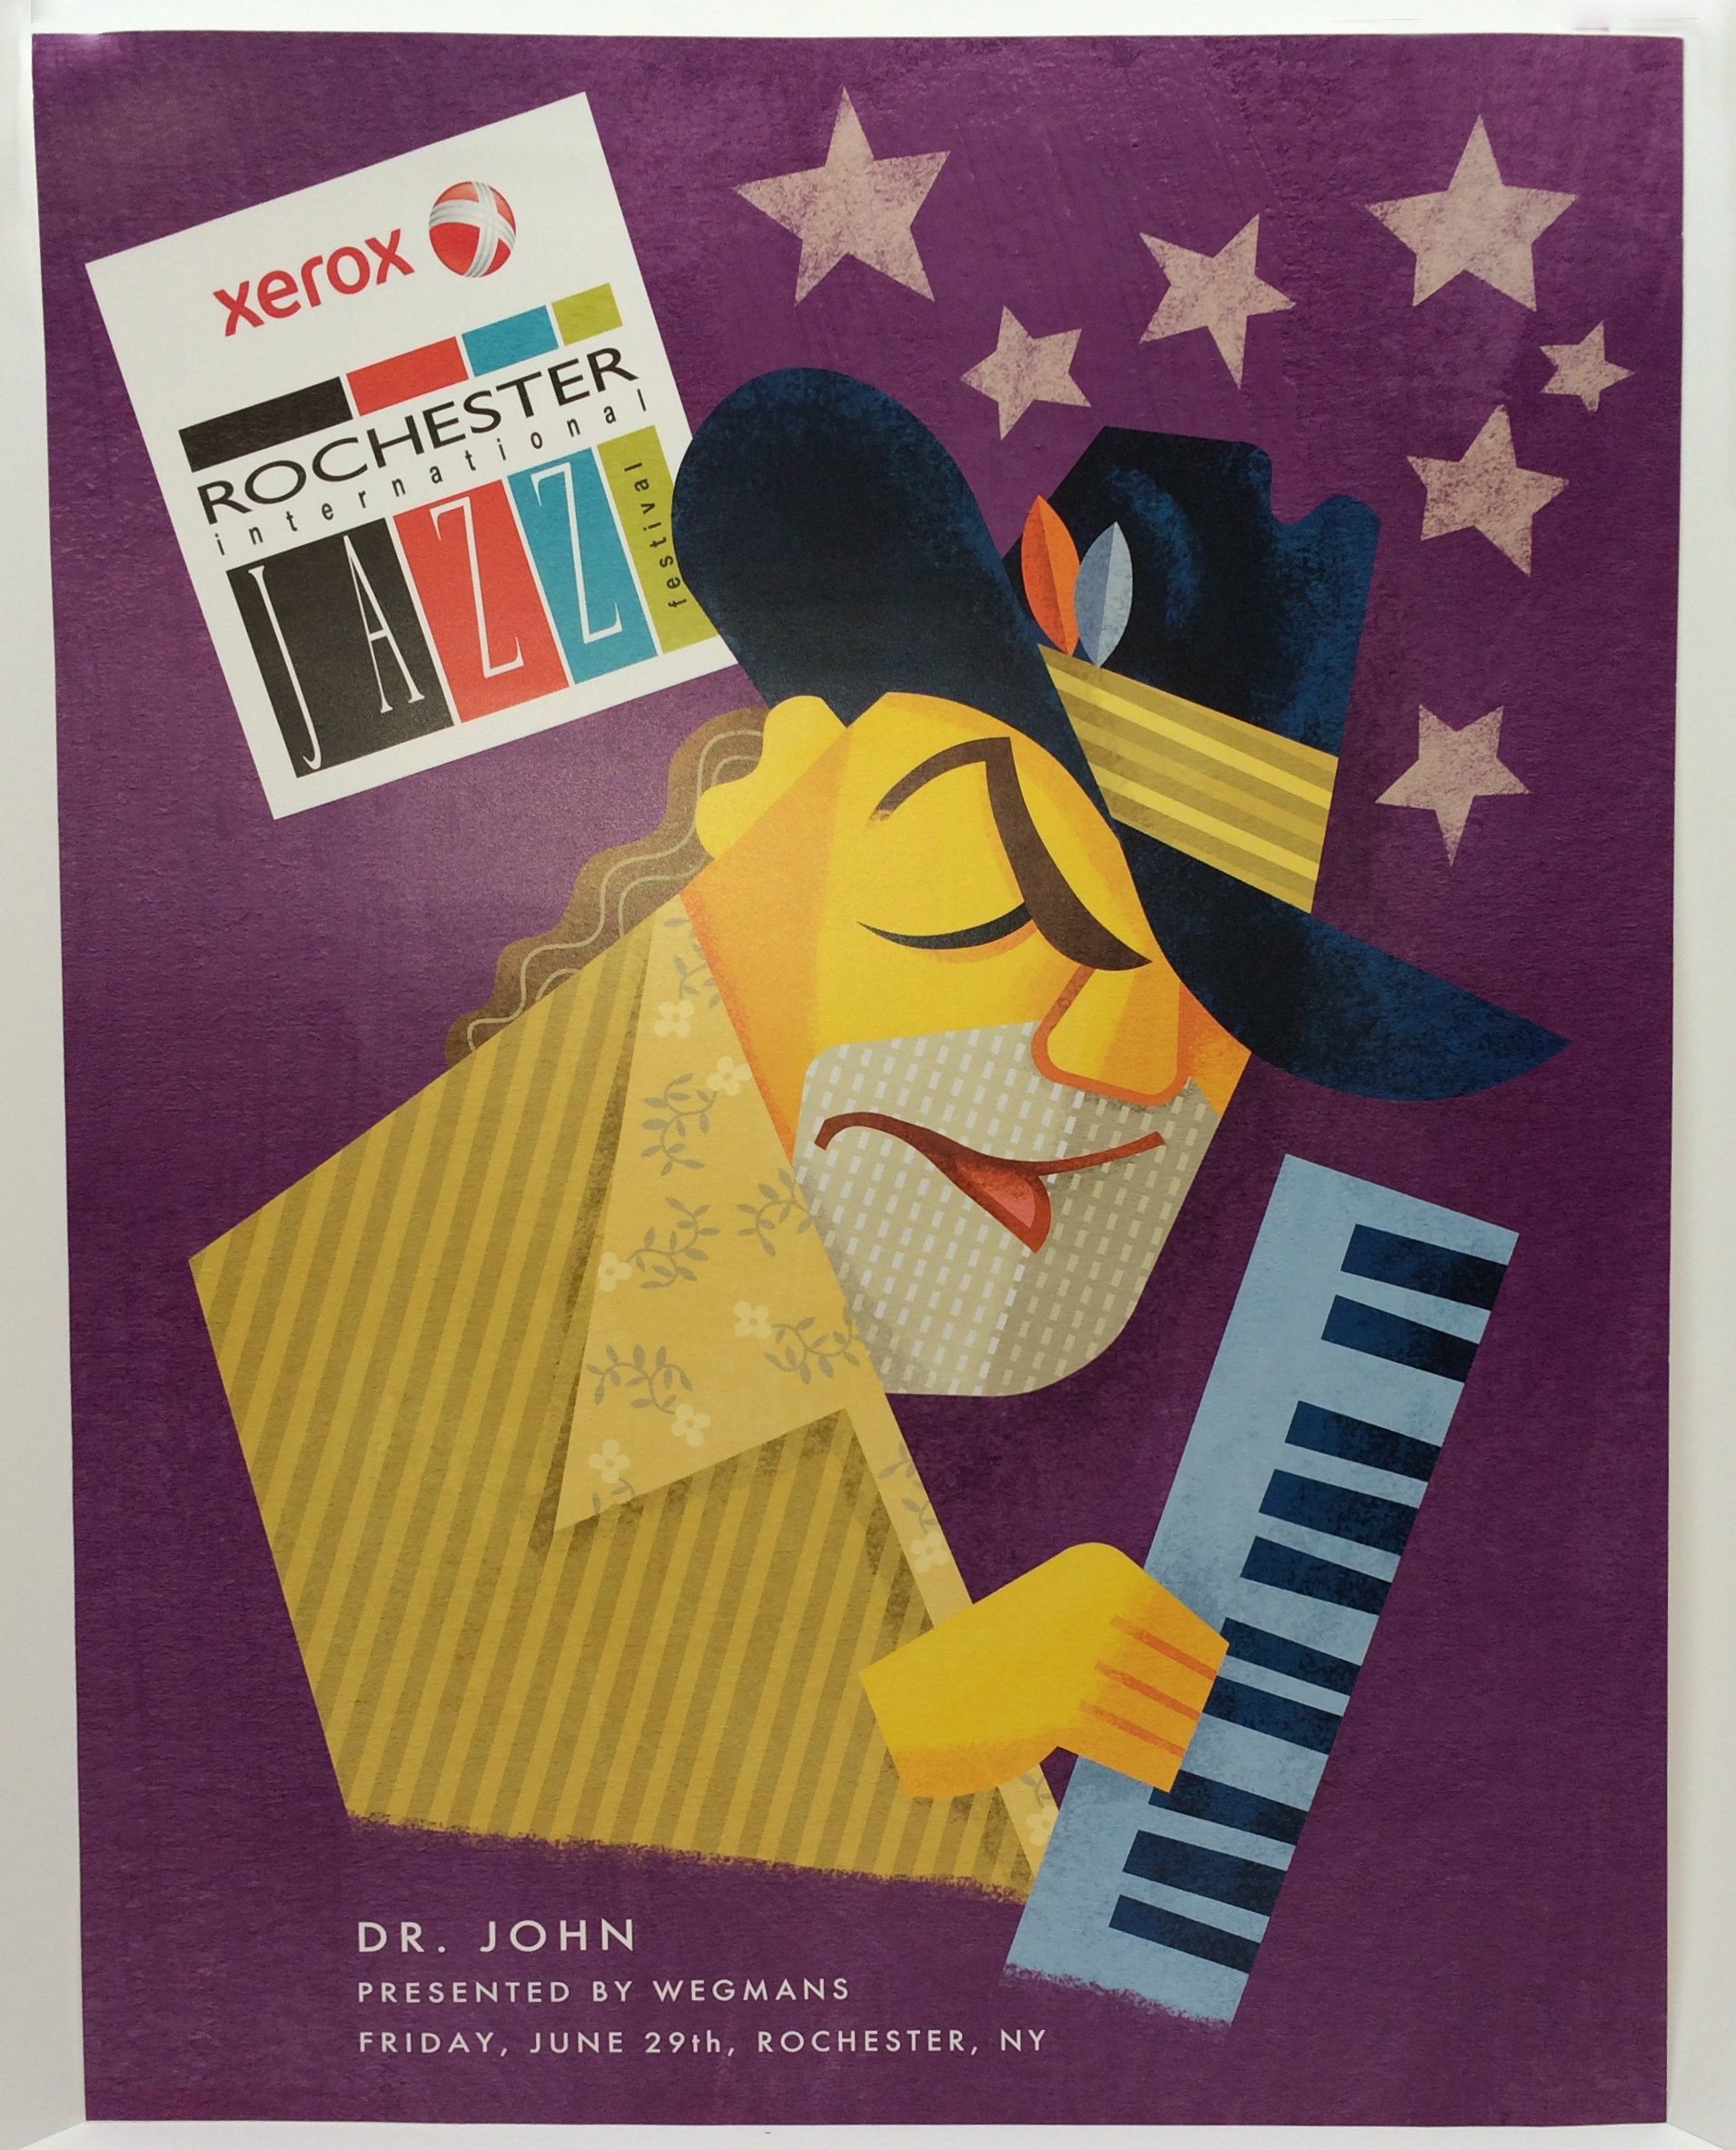 Wide-Format, artist promo poster for 2013 Rochester Jazz Festival